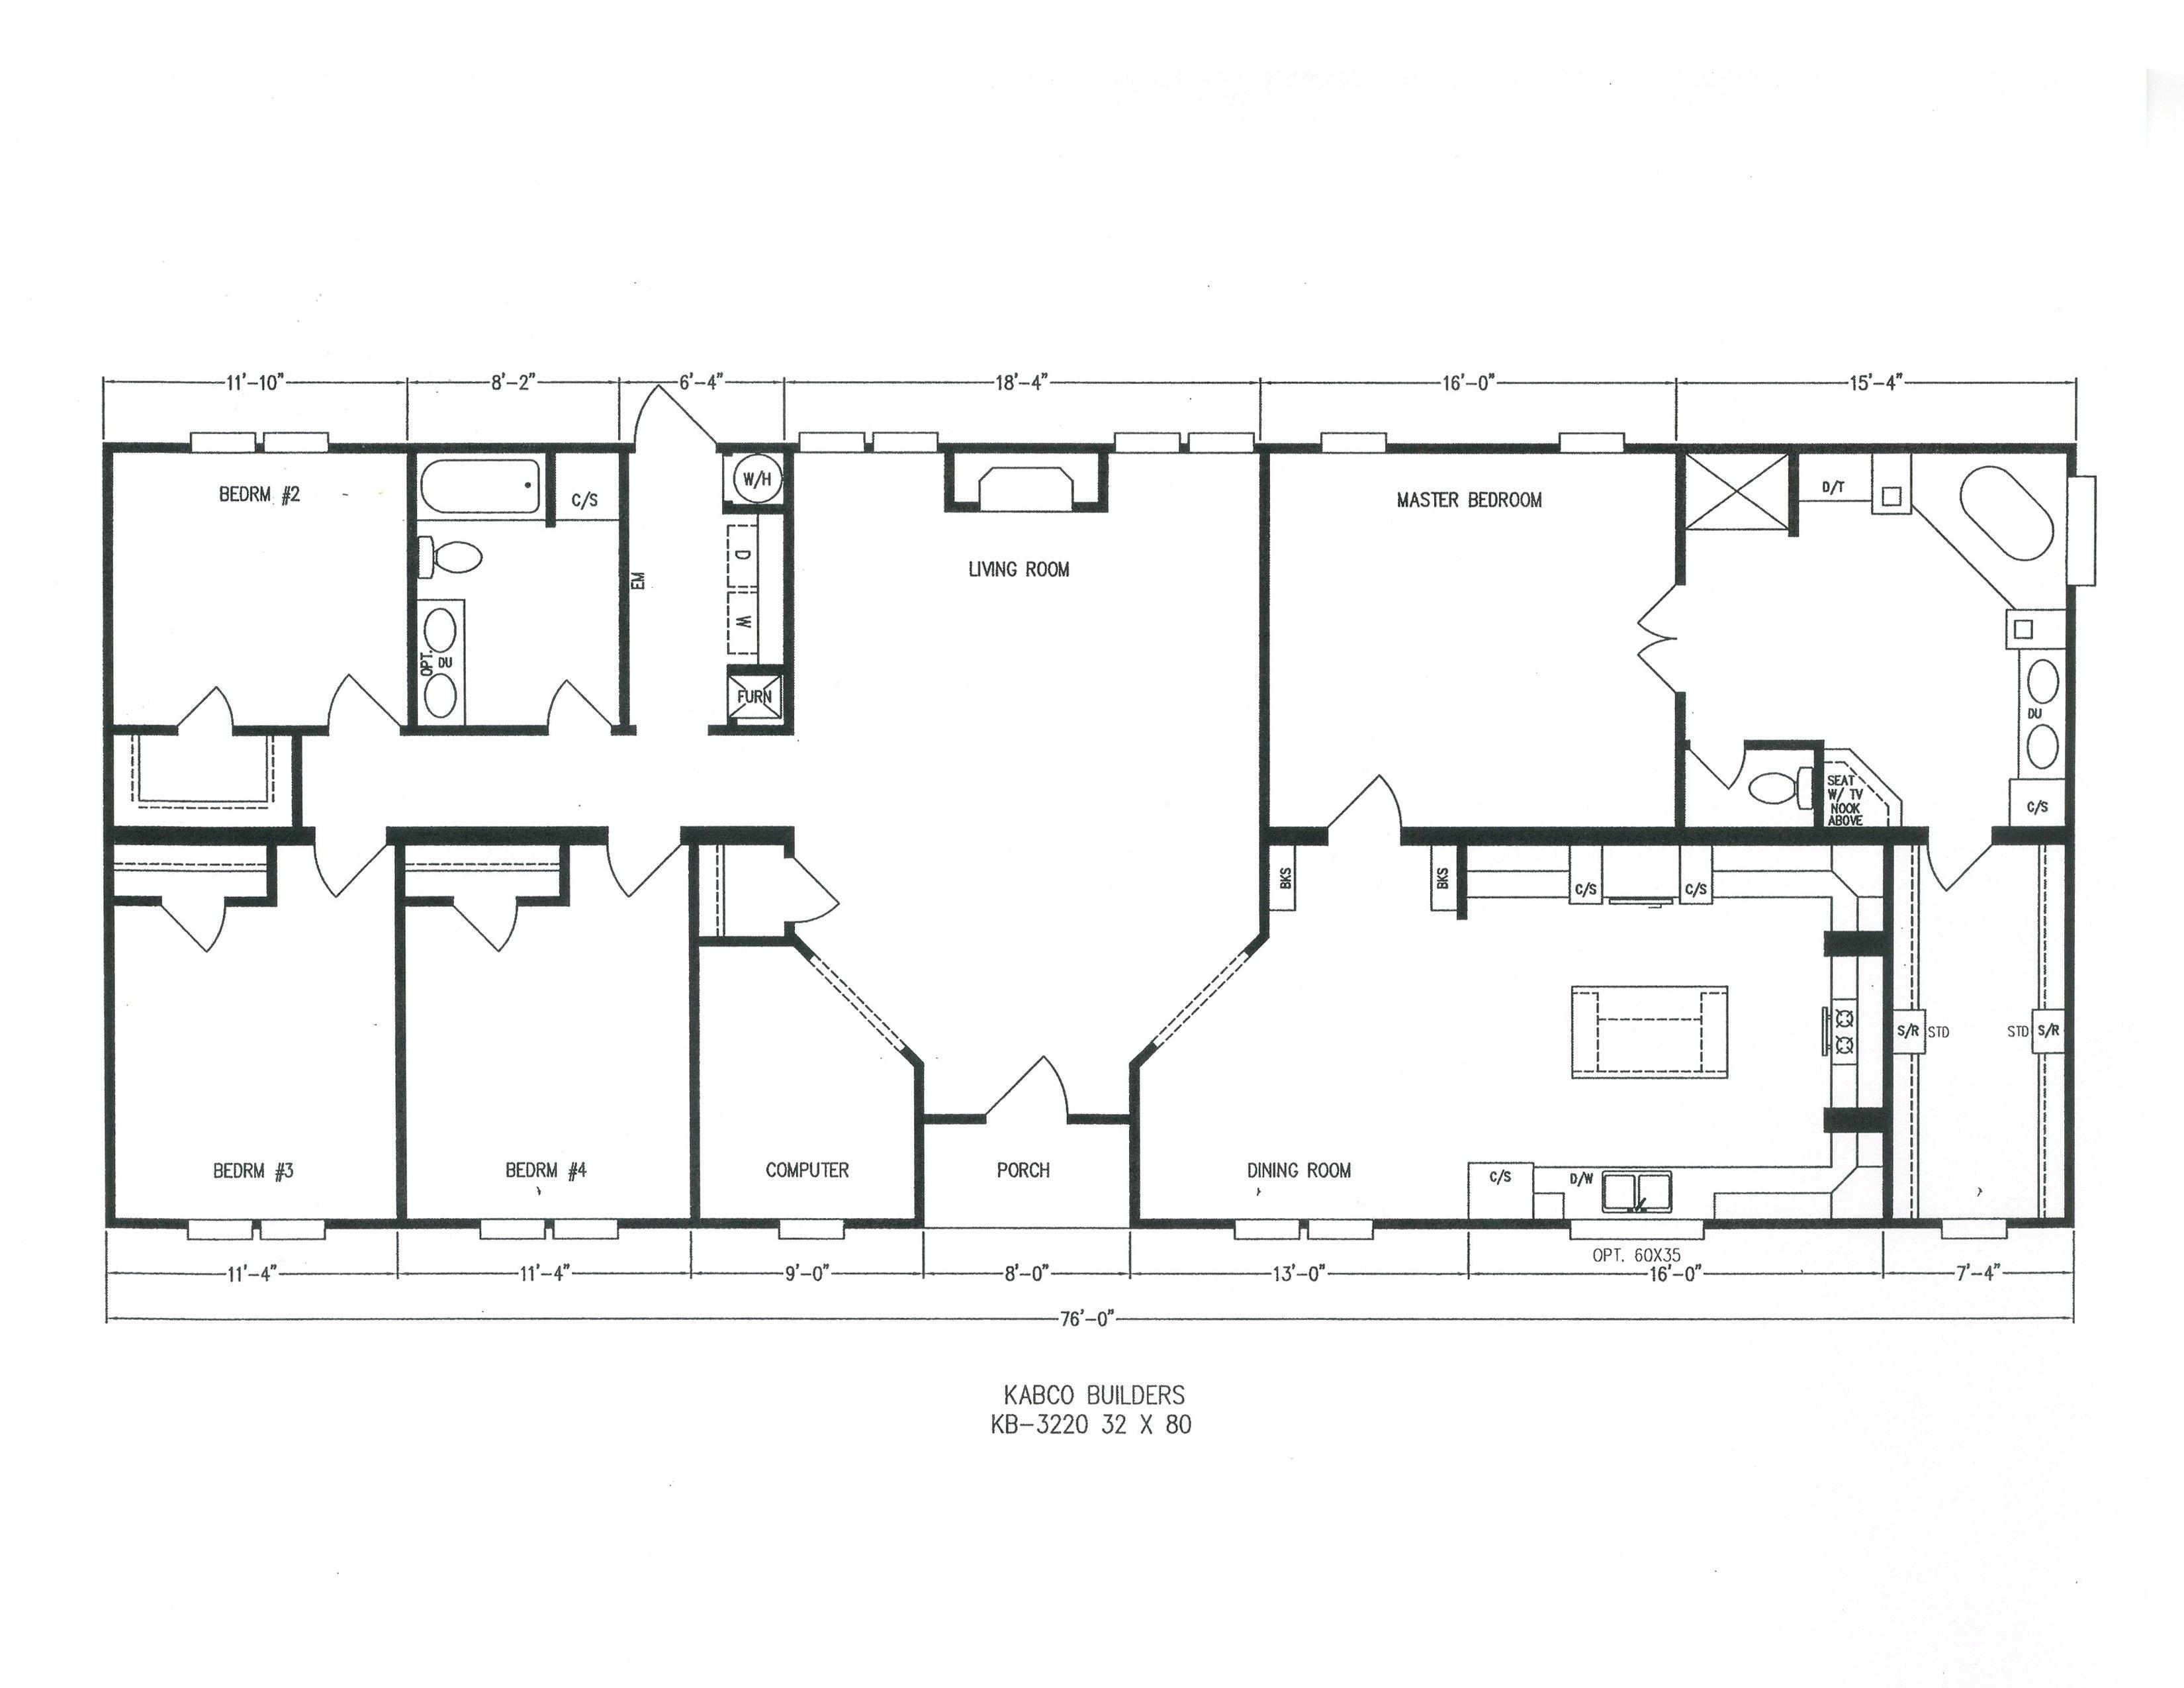 4 bedroom double wide mobile home floor plans http 4 bedroom double wide mobile home floor plans http modtopiastudio com double wide mobile home floor plans features home design ideas pinterest